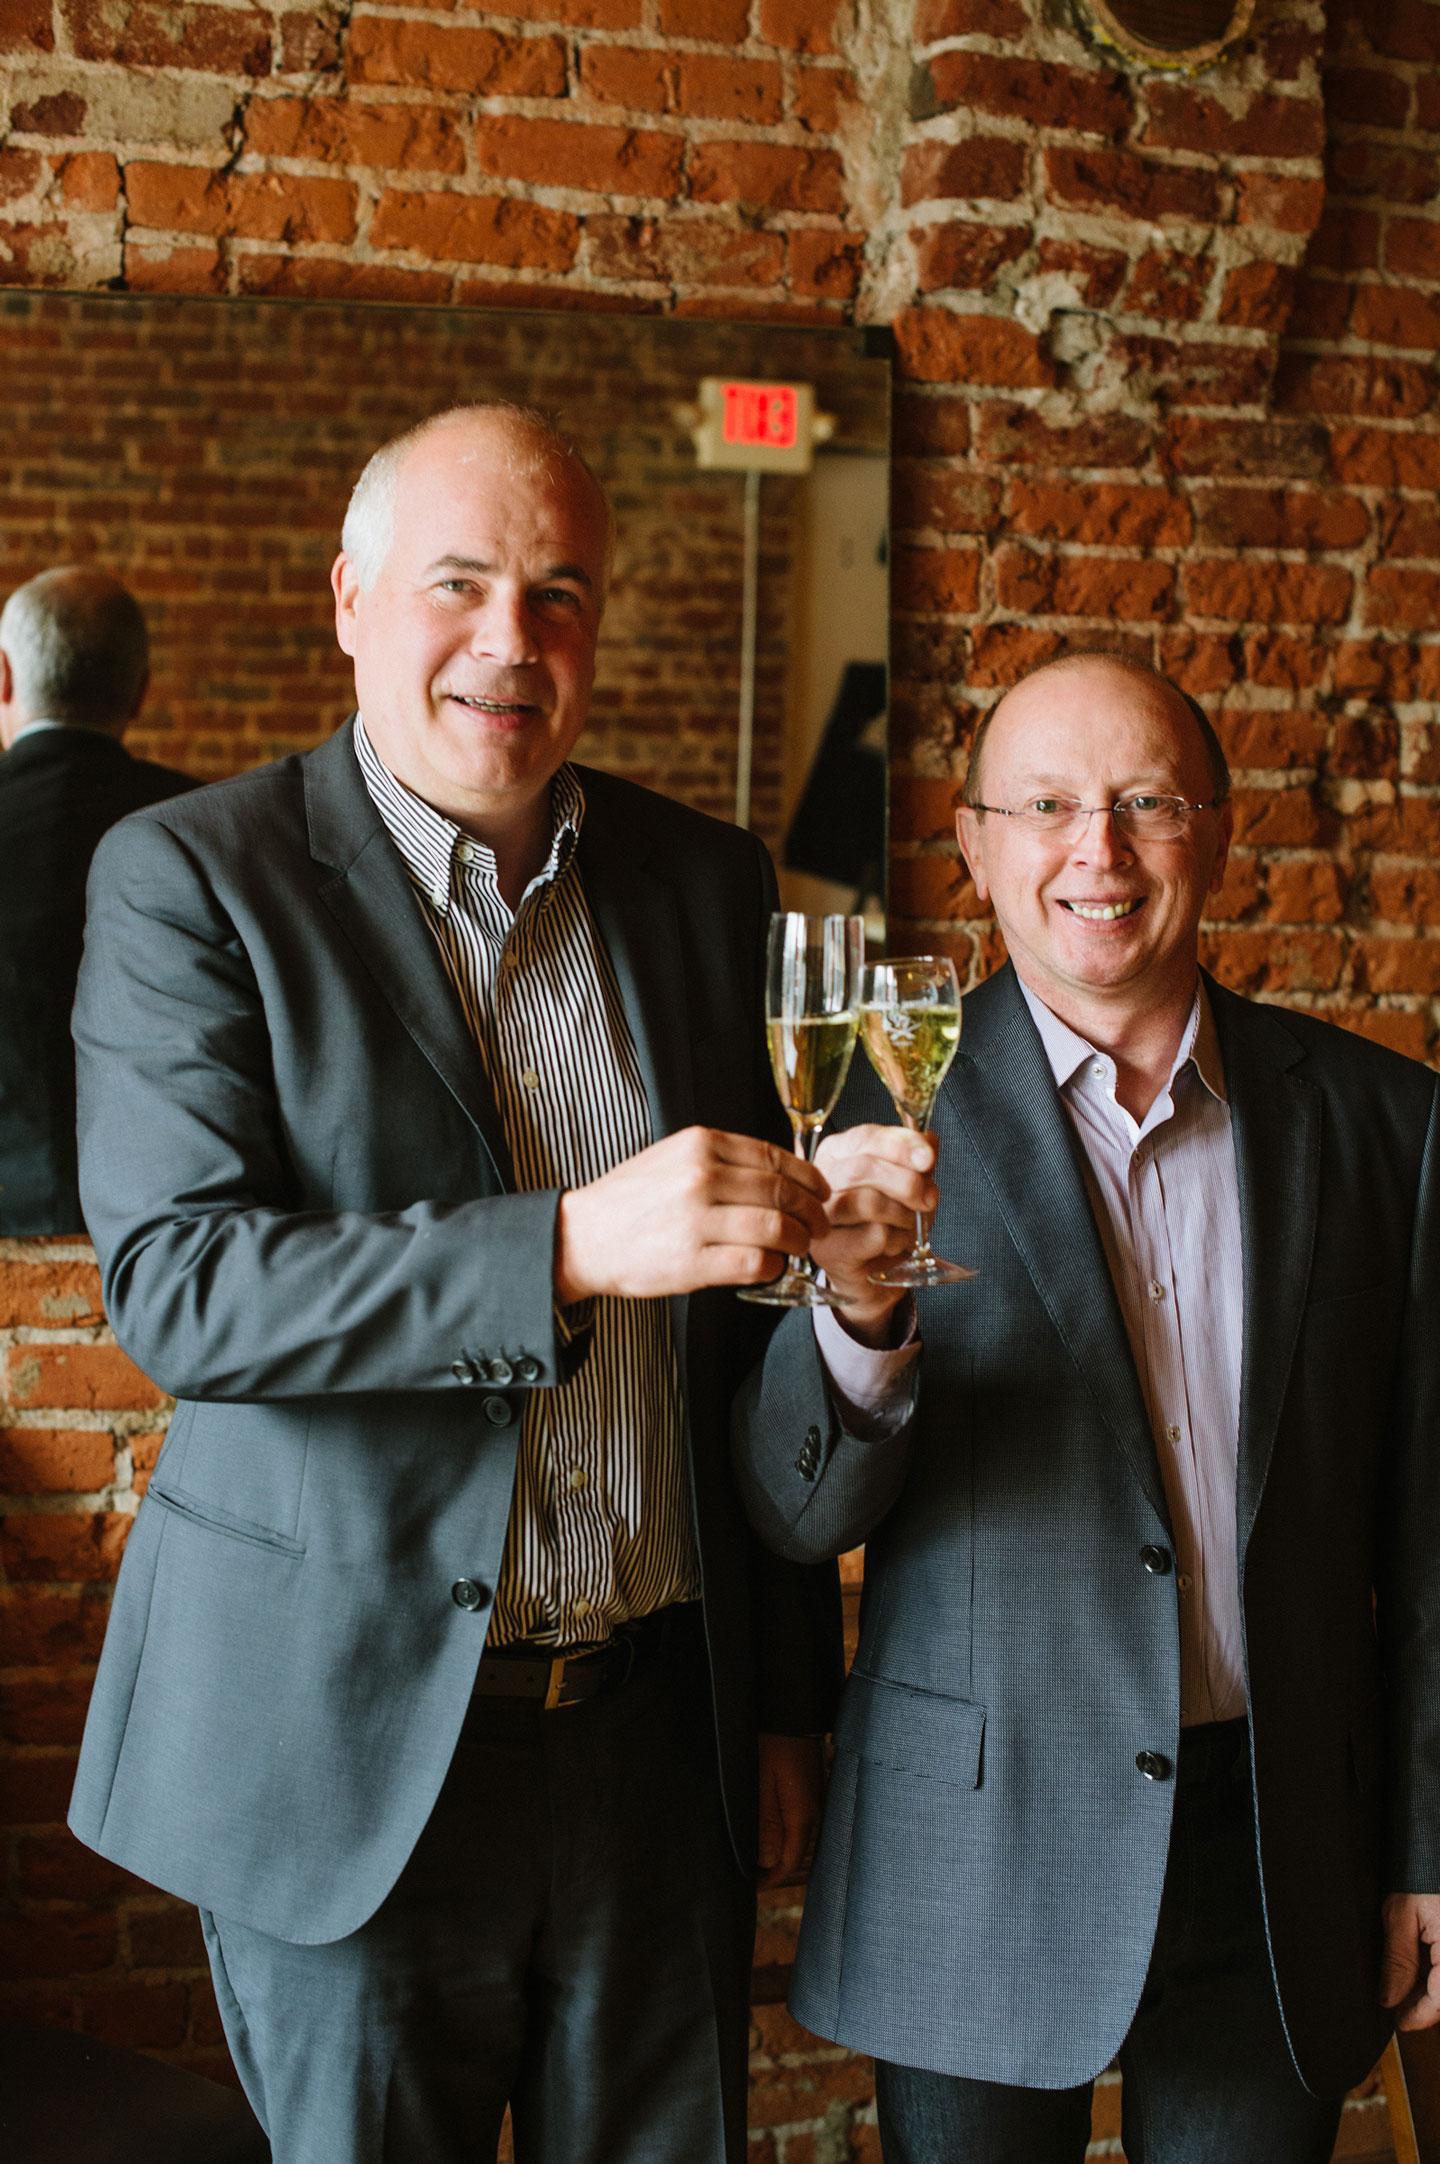 Thibaut Jannison Winery - Virginia Sparkling Wines - Claude Thibaut and Manuel Jannison